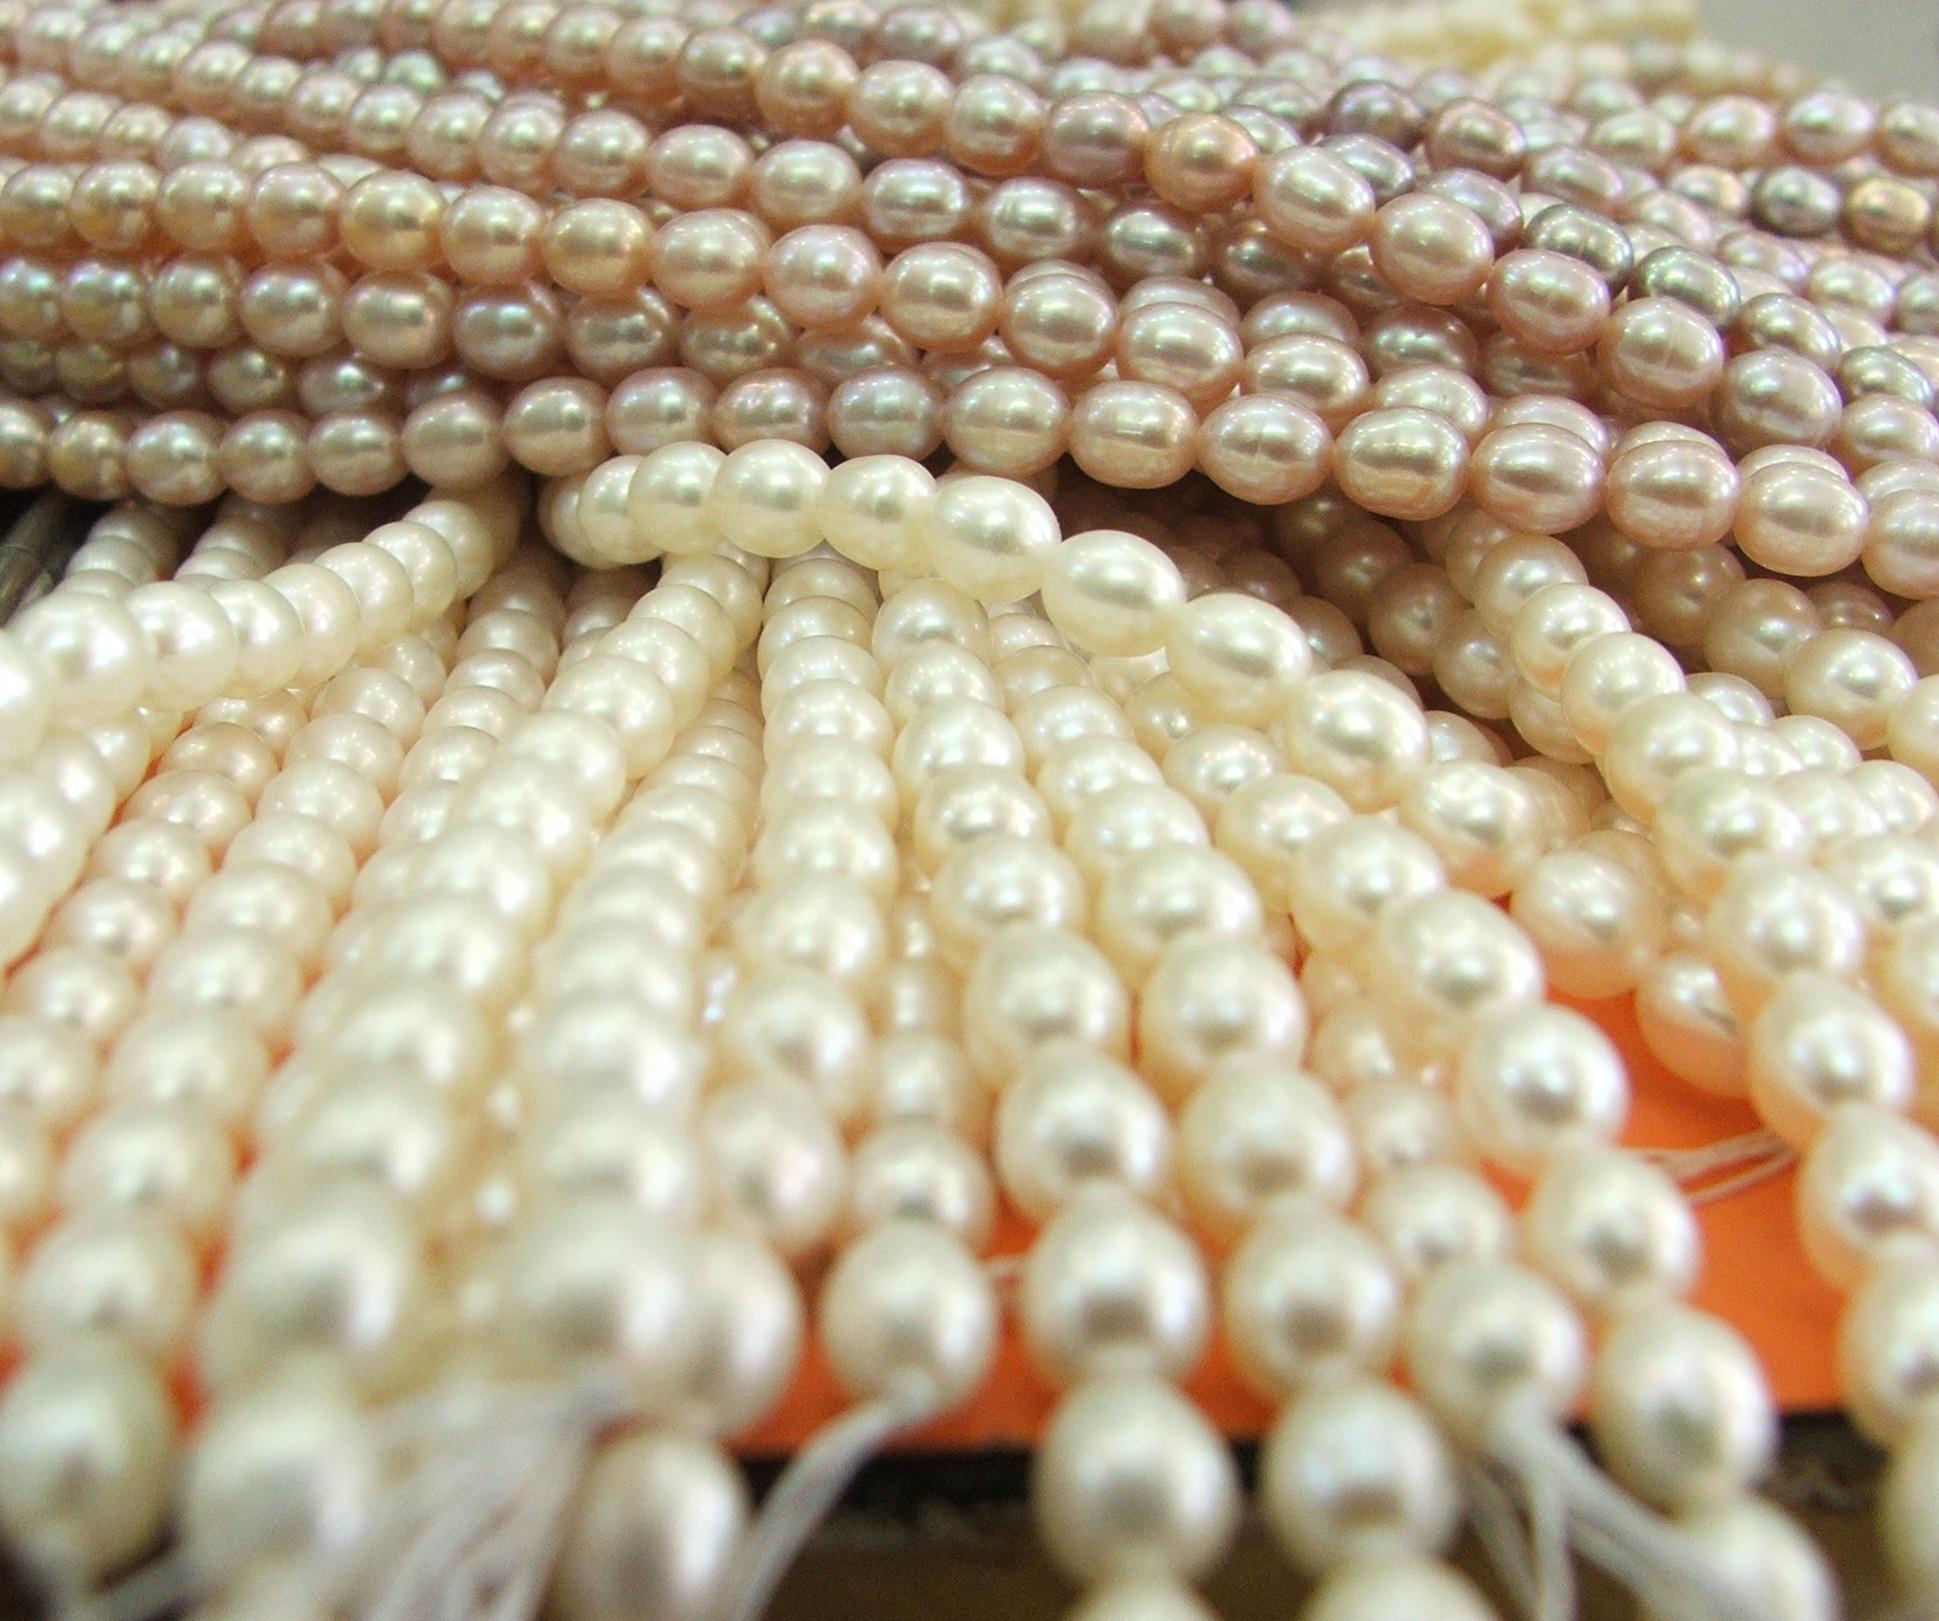 File:Laad Bazaar Pearls1.jpg